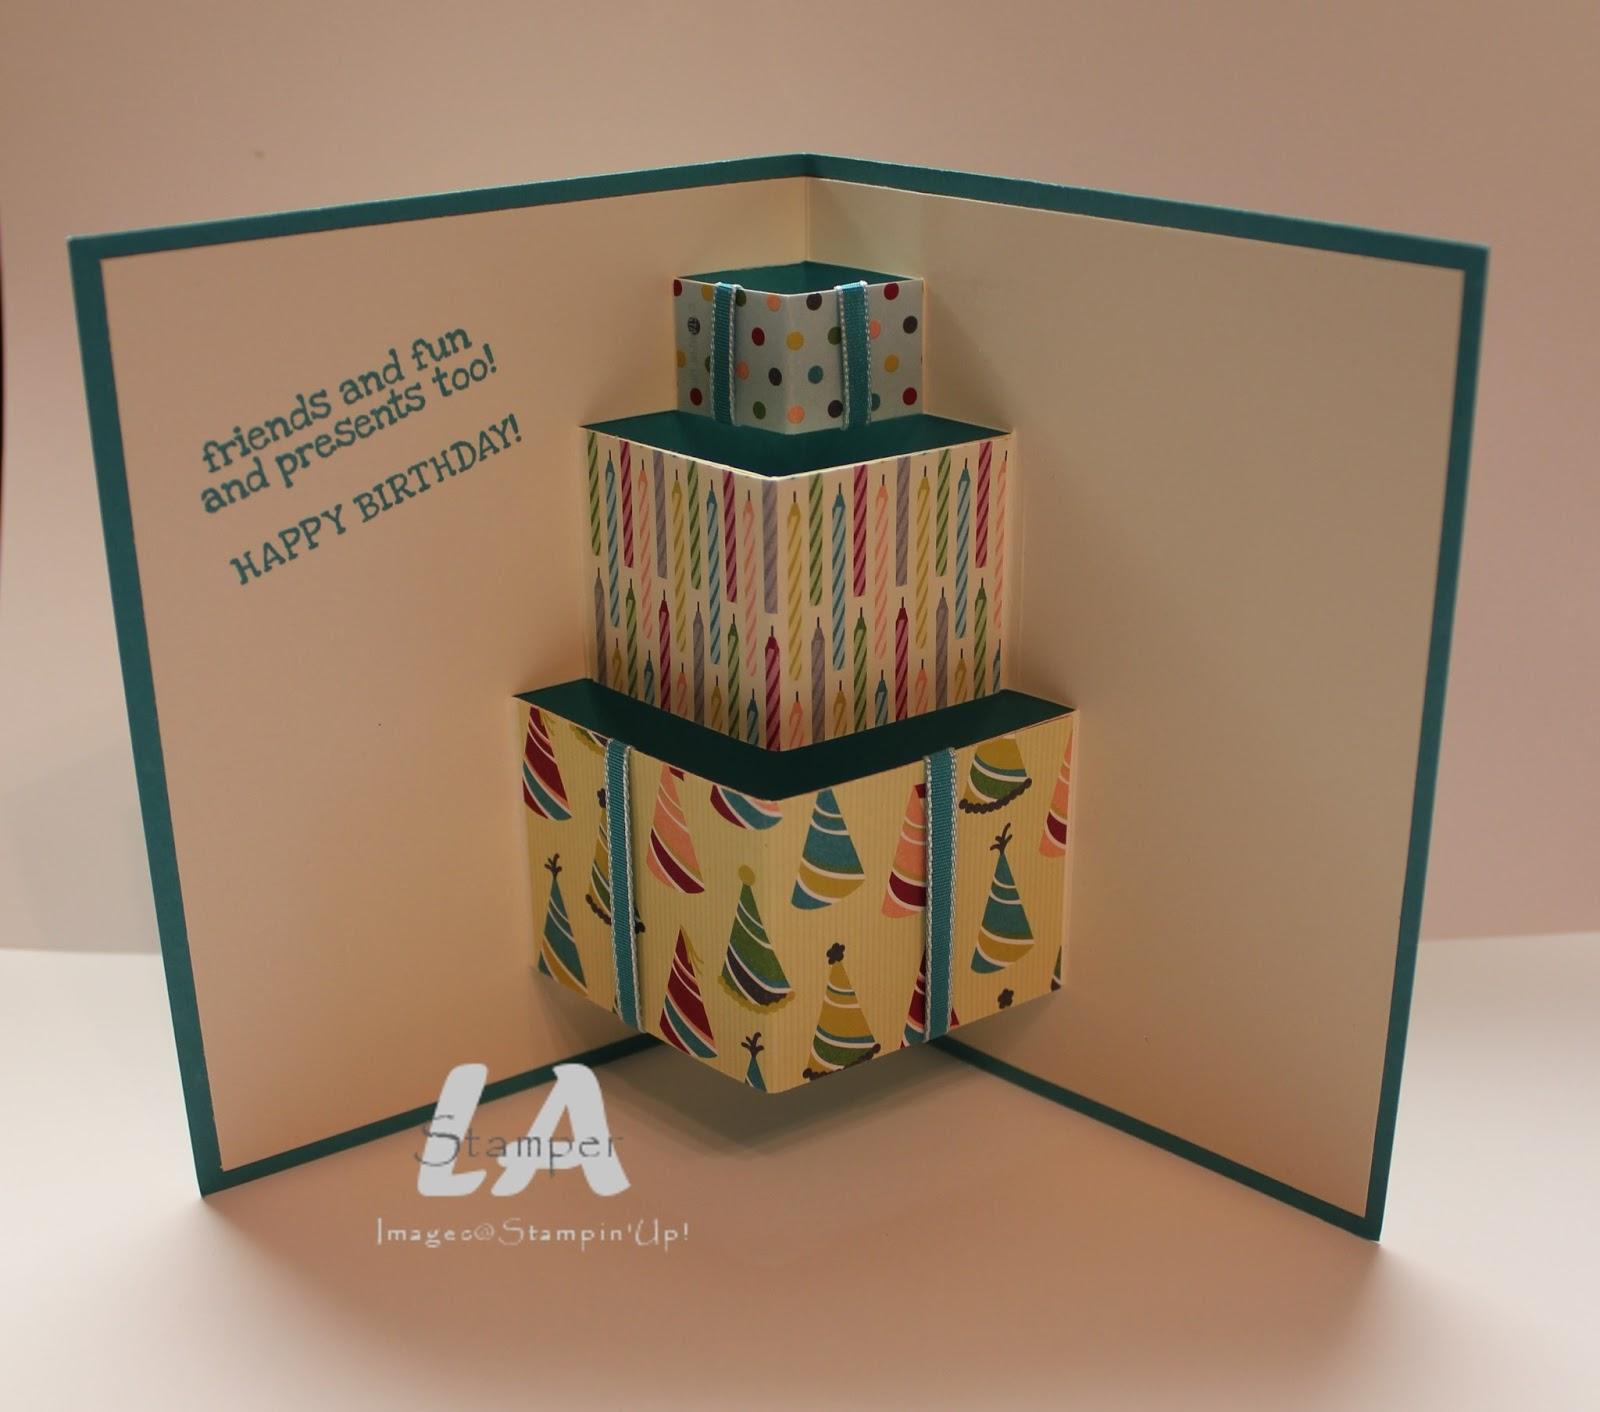 La Stamper Birthday Basics Pop Up Presents Card